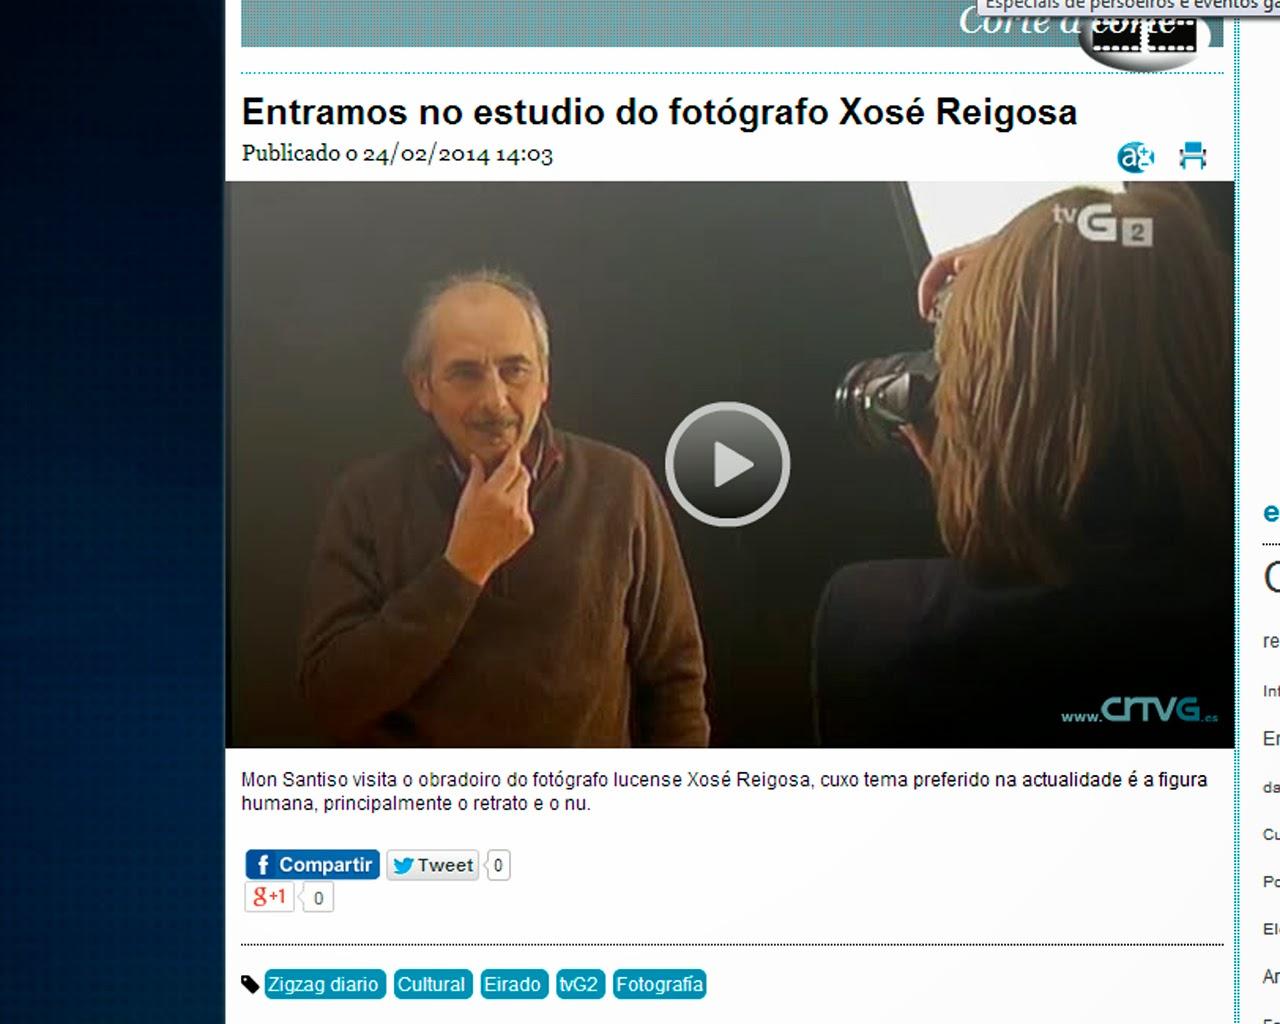 http://www.crtvg.es/cultural/corte-a-corte/entramos-no-estudio-do-fotografo-xose-reigosa